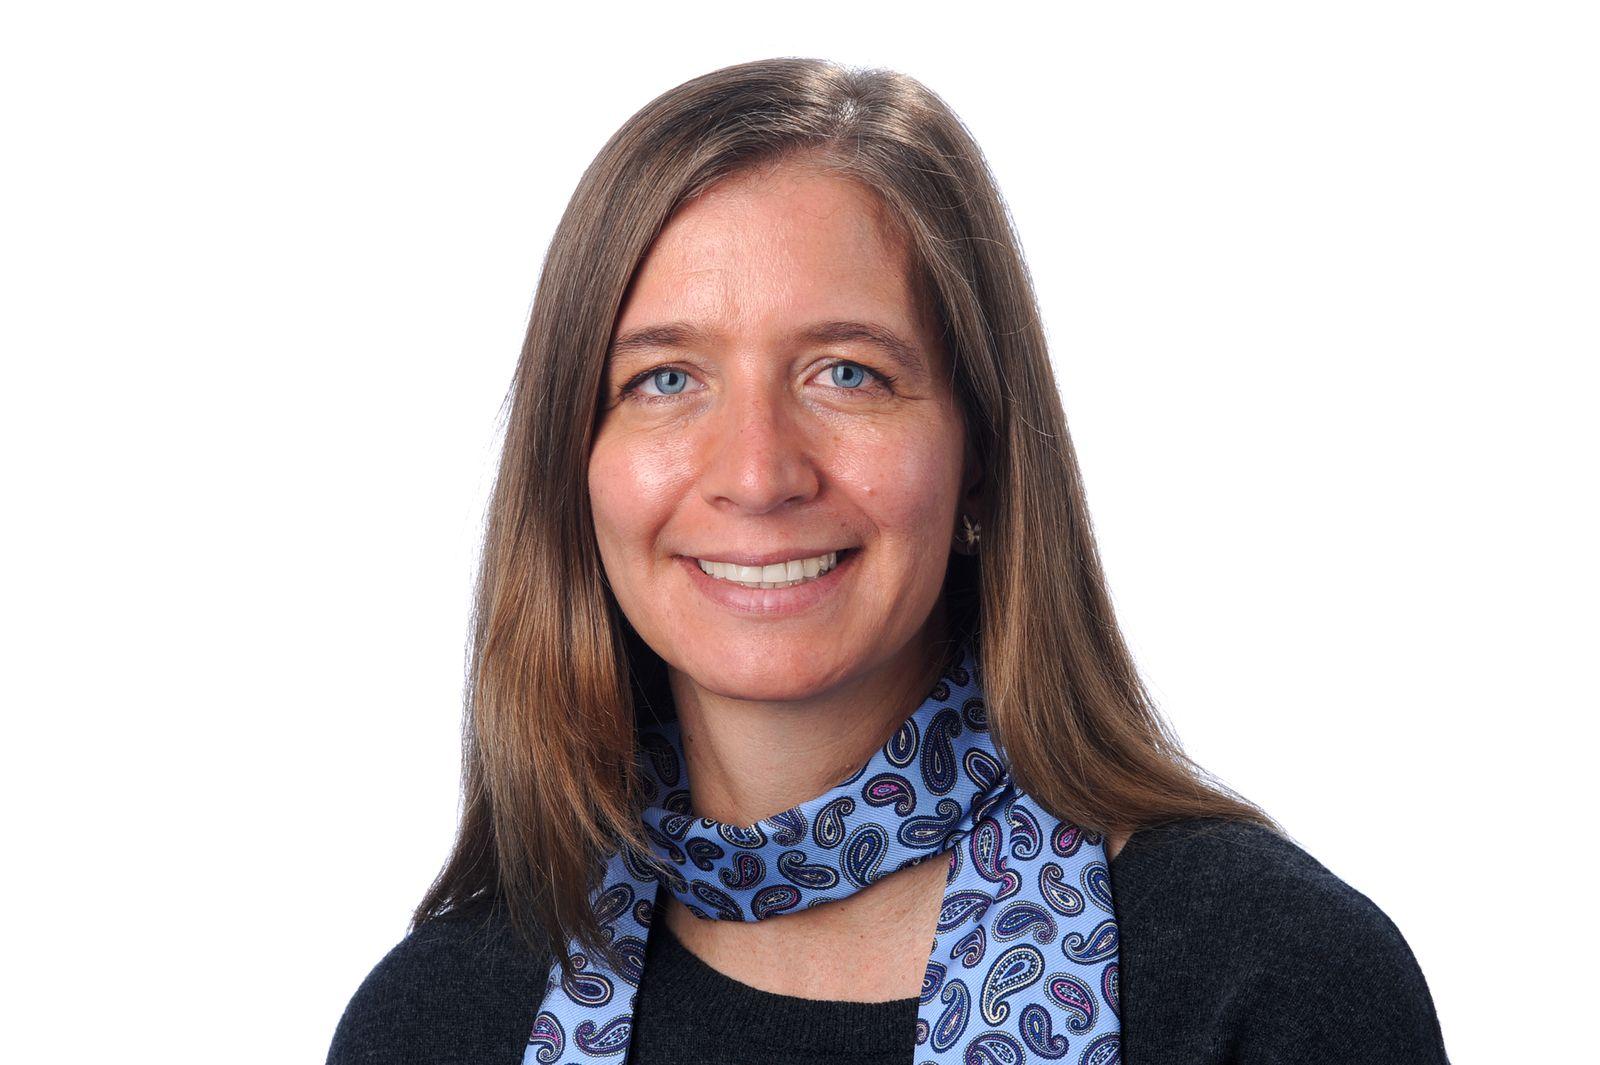 Dr. Camilla Rothe